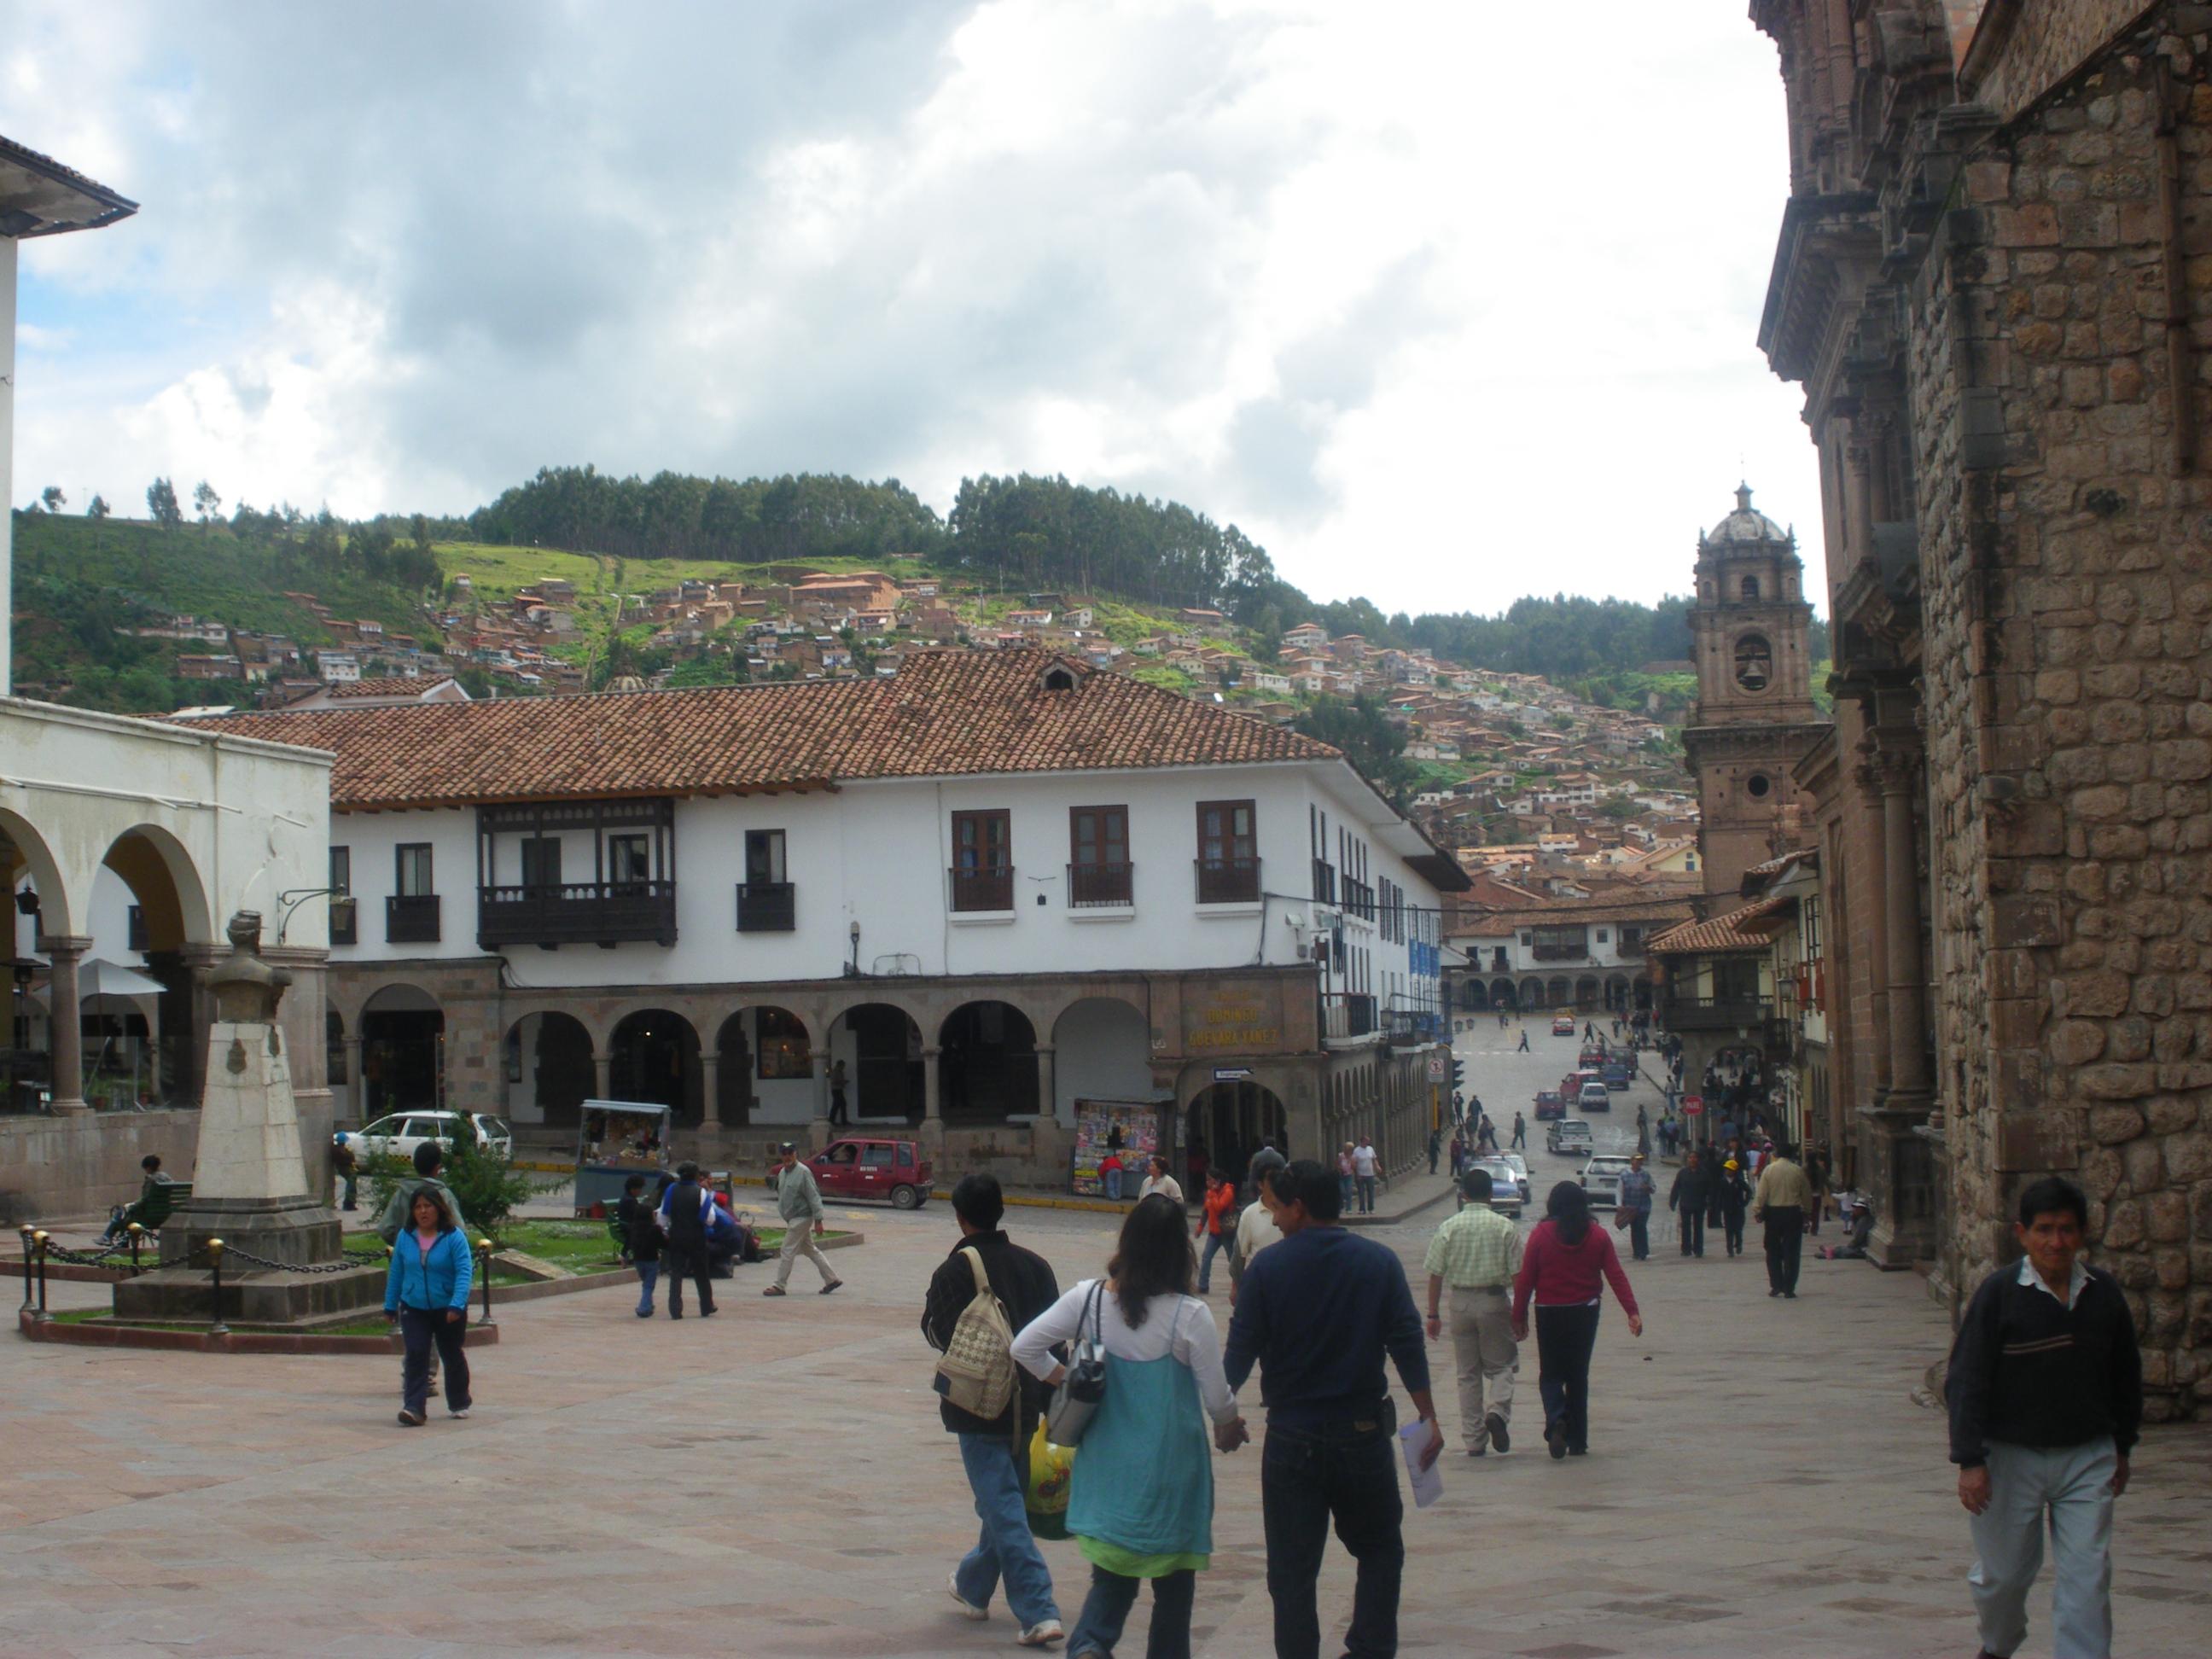 Plaza De Armas, the center of downtown Cusco